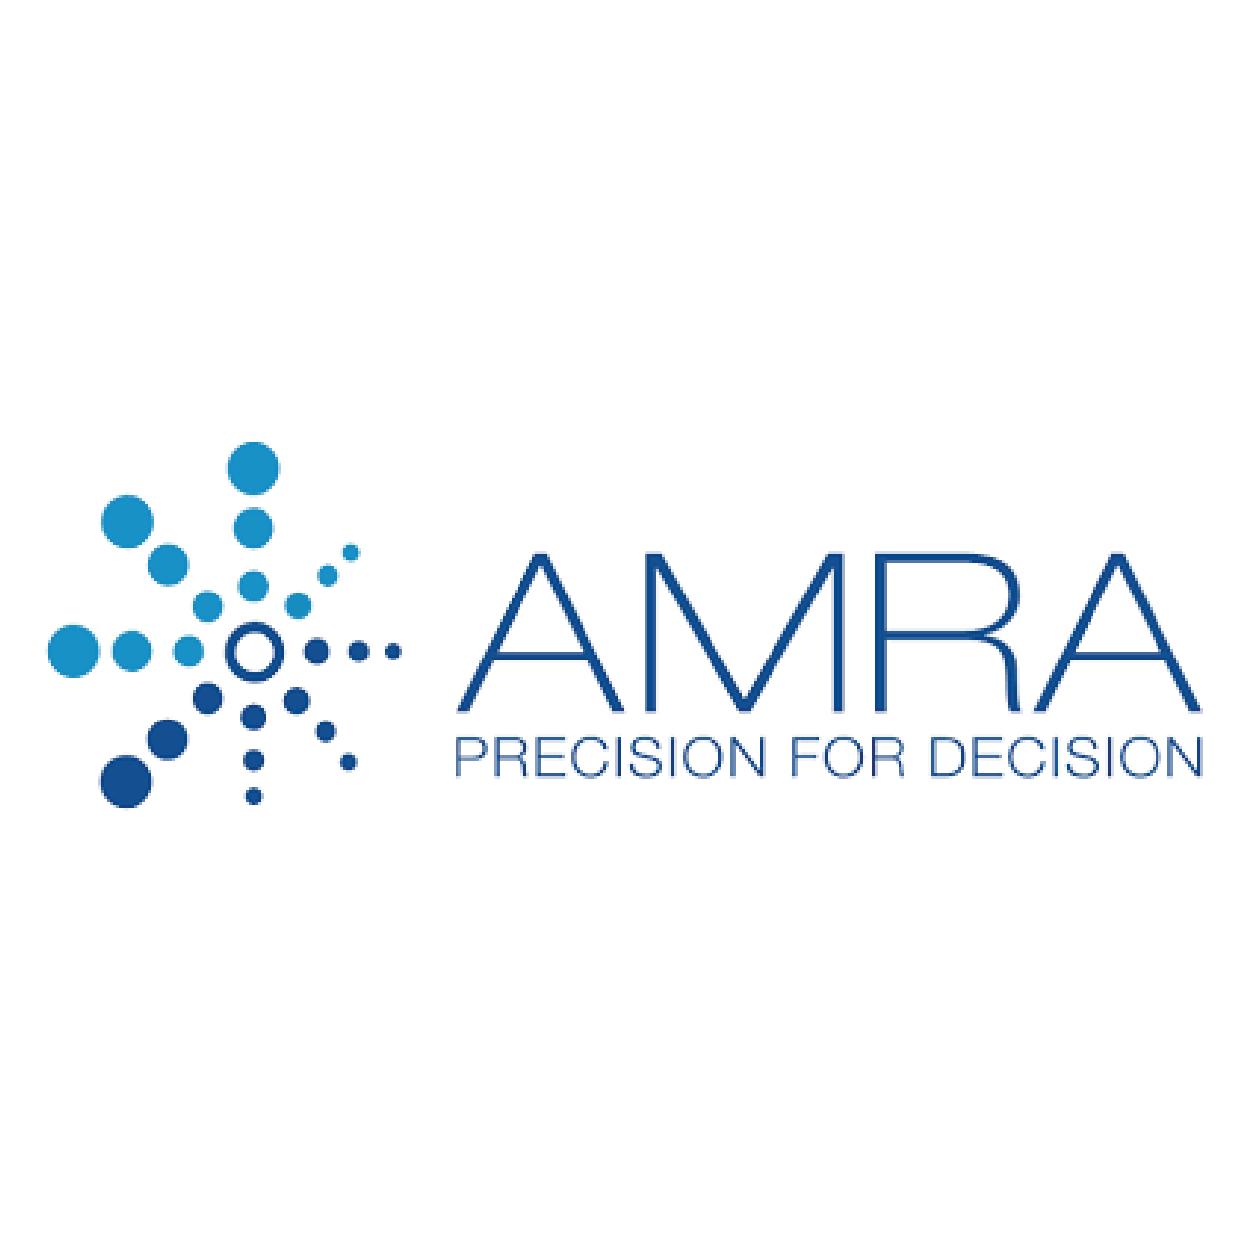 AMRA Medical